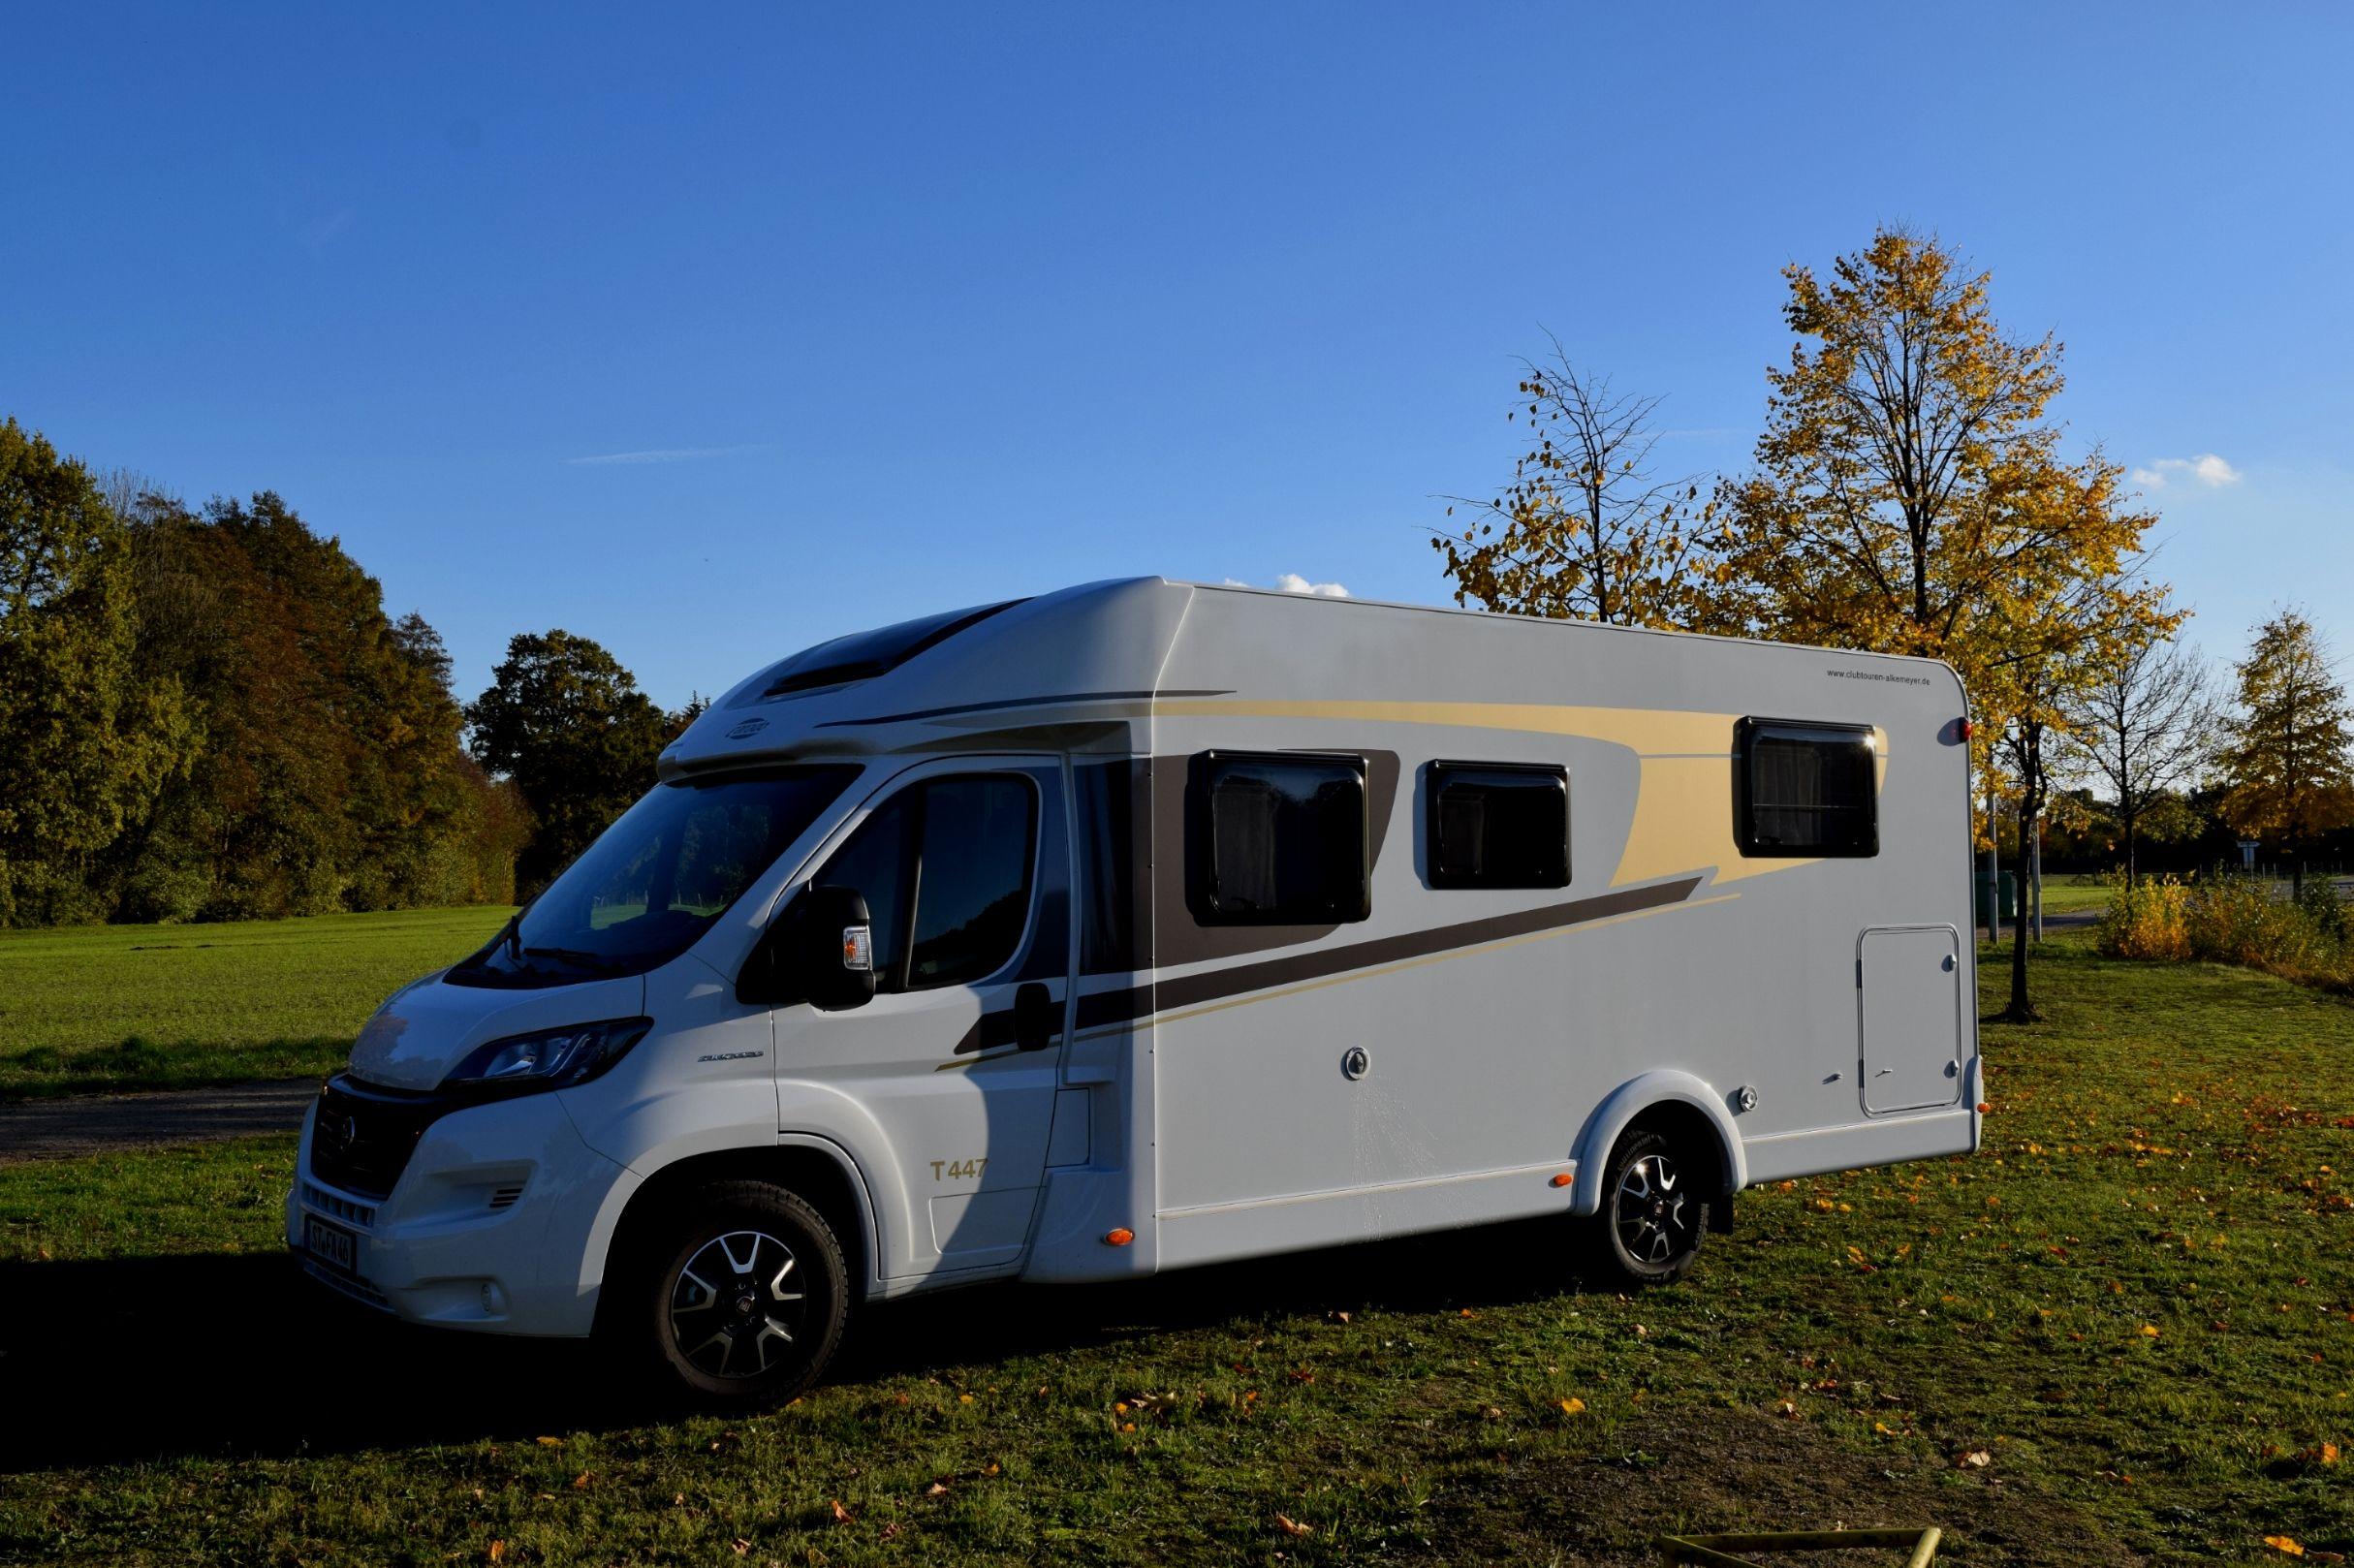 Alkemeyer Wohnmobil & Fahrzeugvermietung